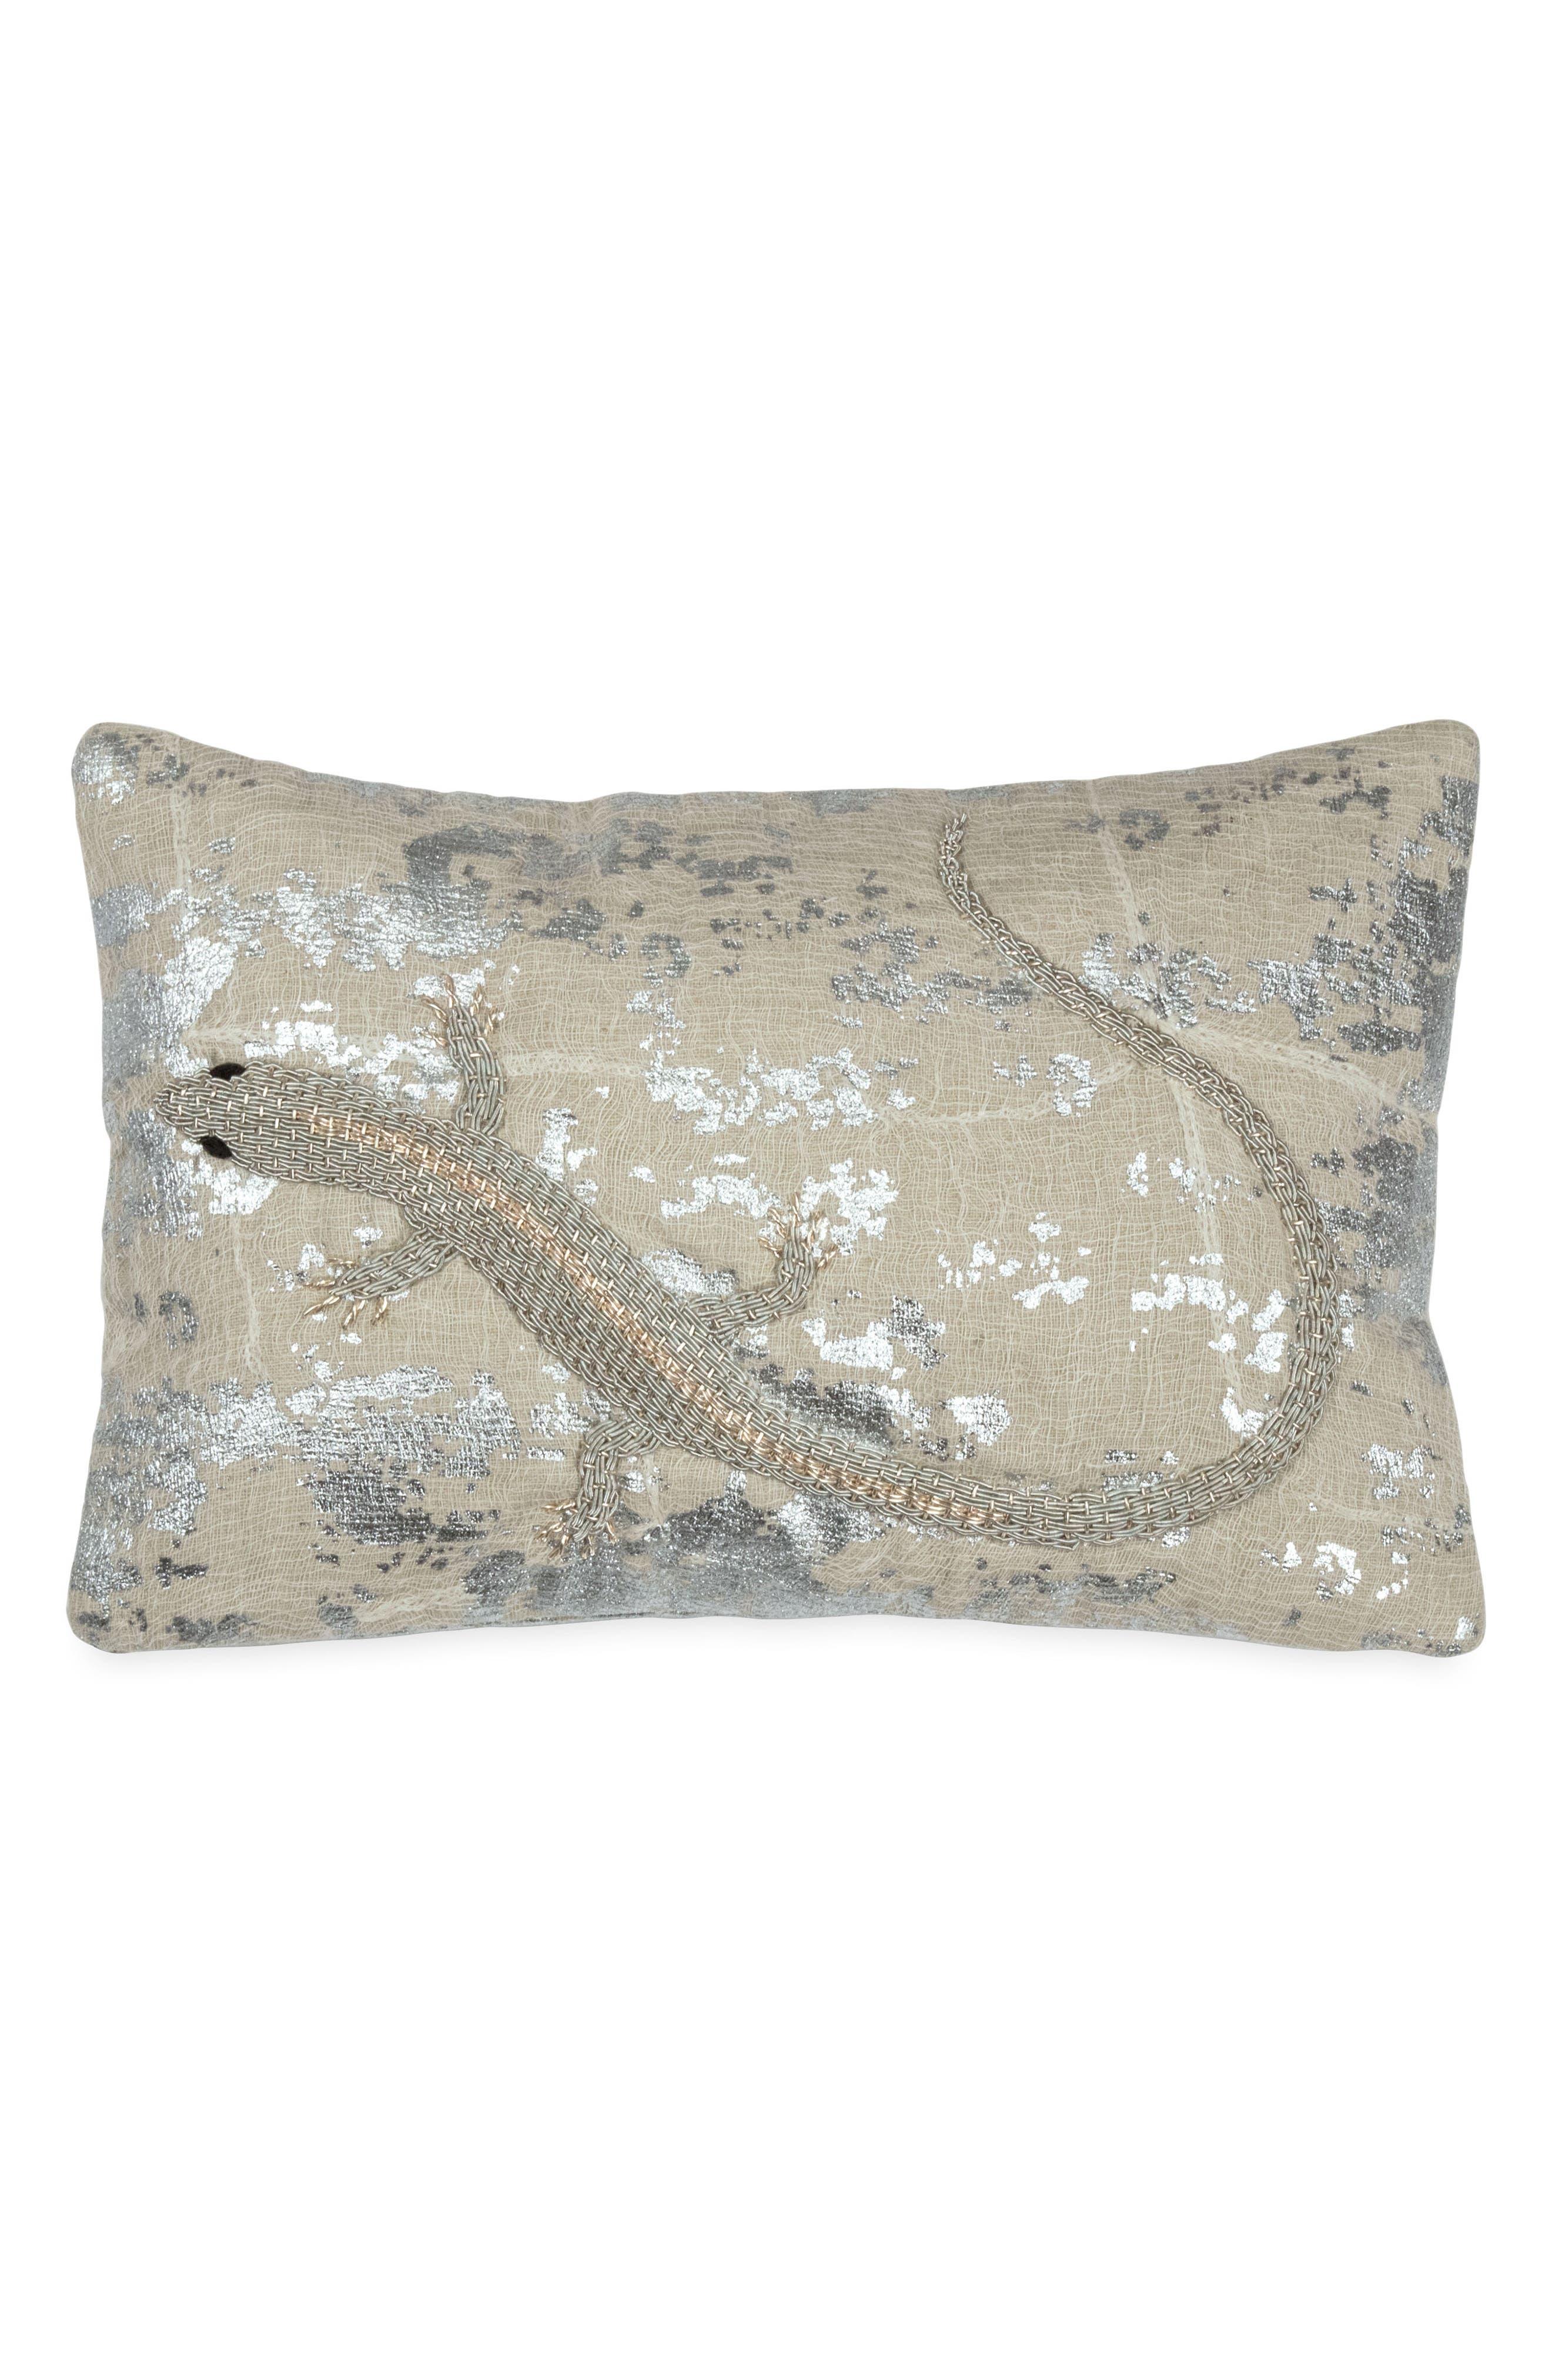 MICHAEL ARAM,                             Lizard Embroidered Decorative Pillow,                             Main thumbnail 1, color,                             SILVER